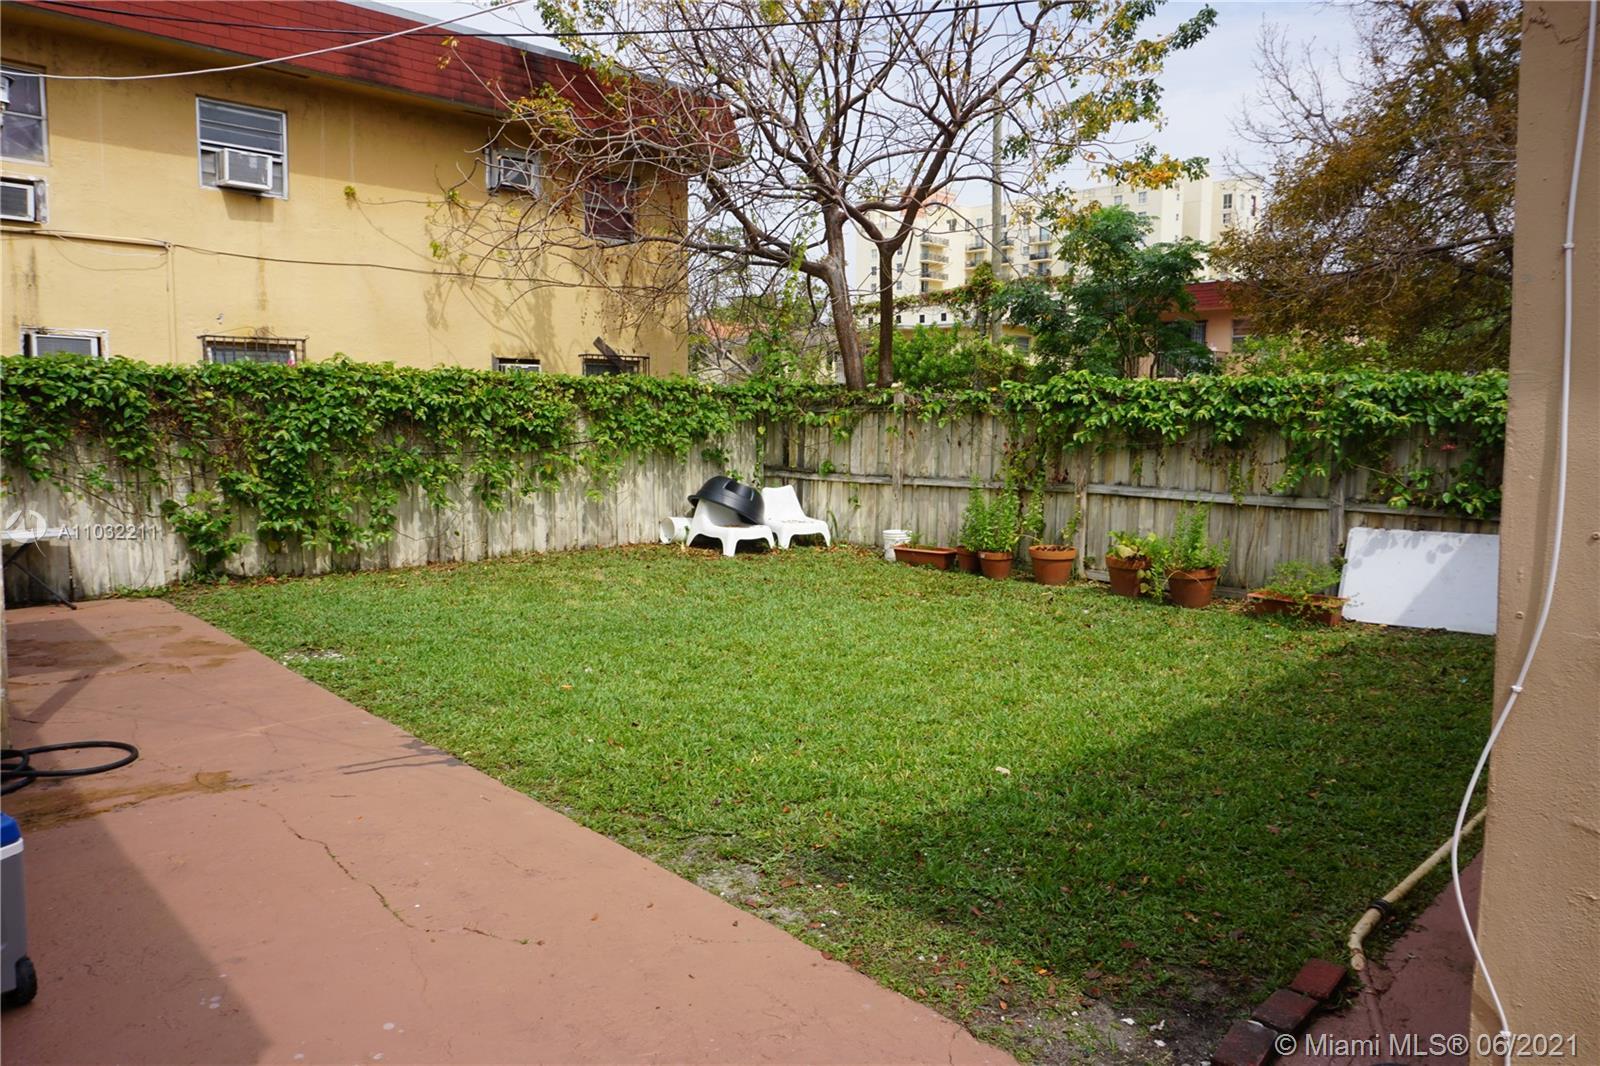 /  2978 sq. ft. $ 2021-04-23 0 Photo